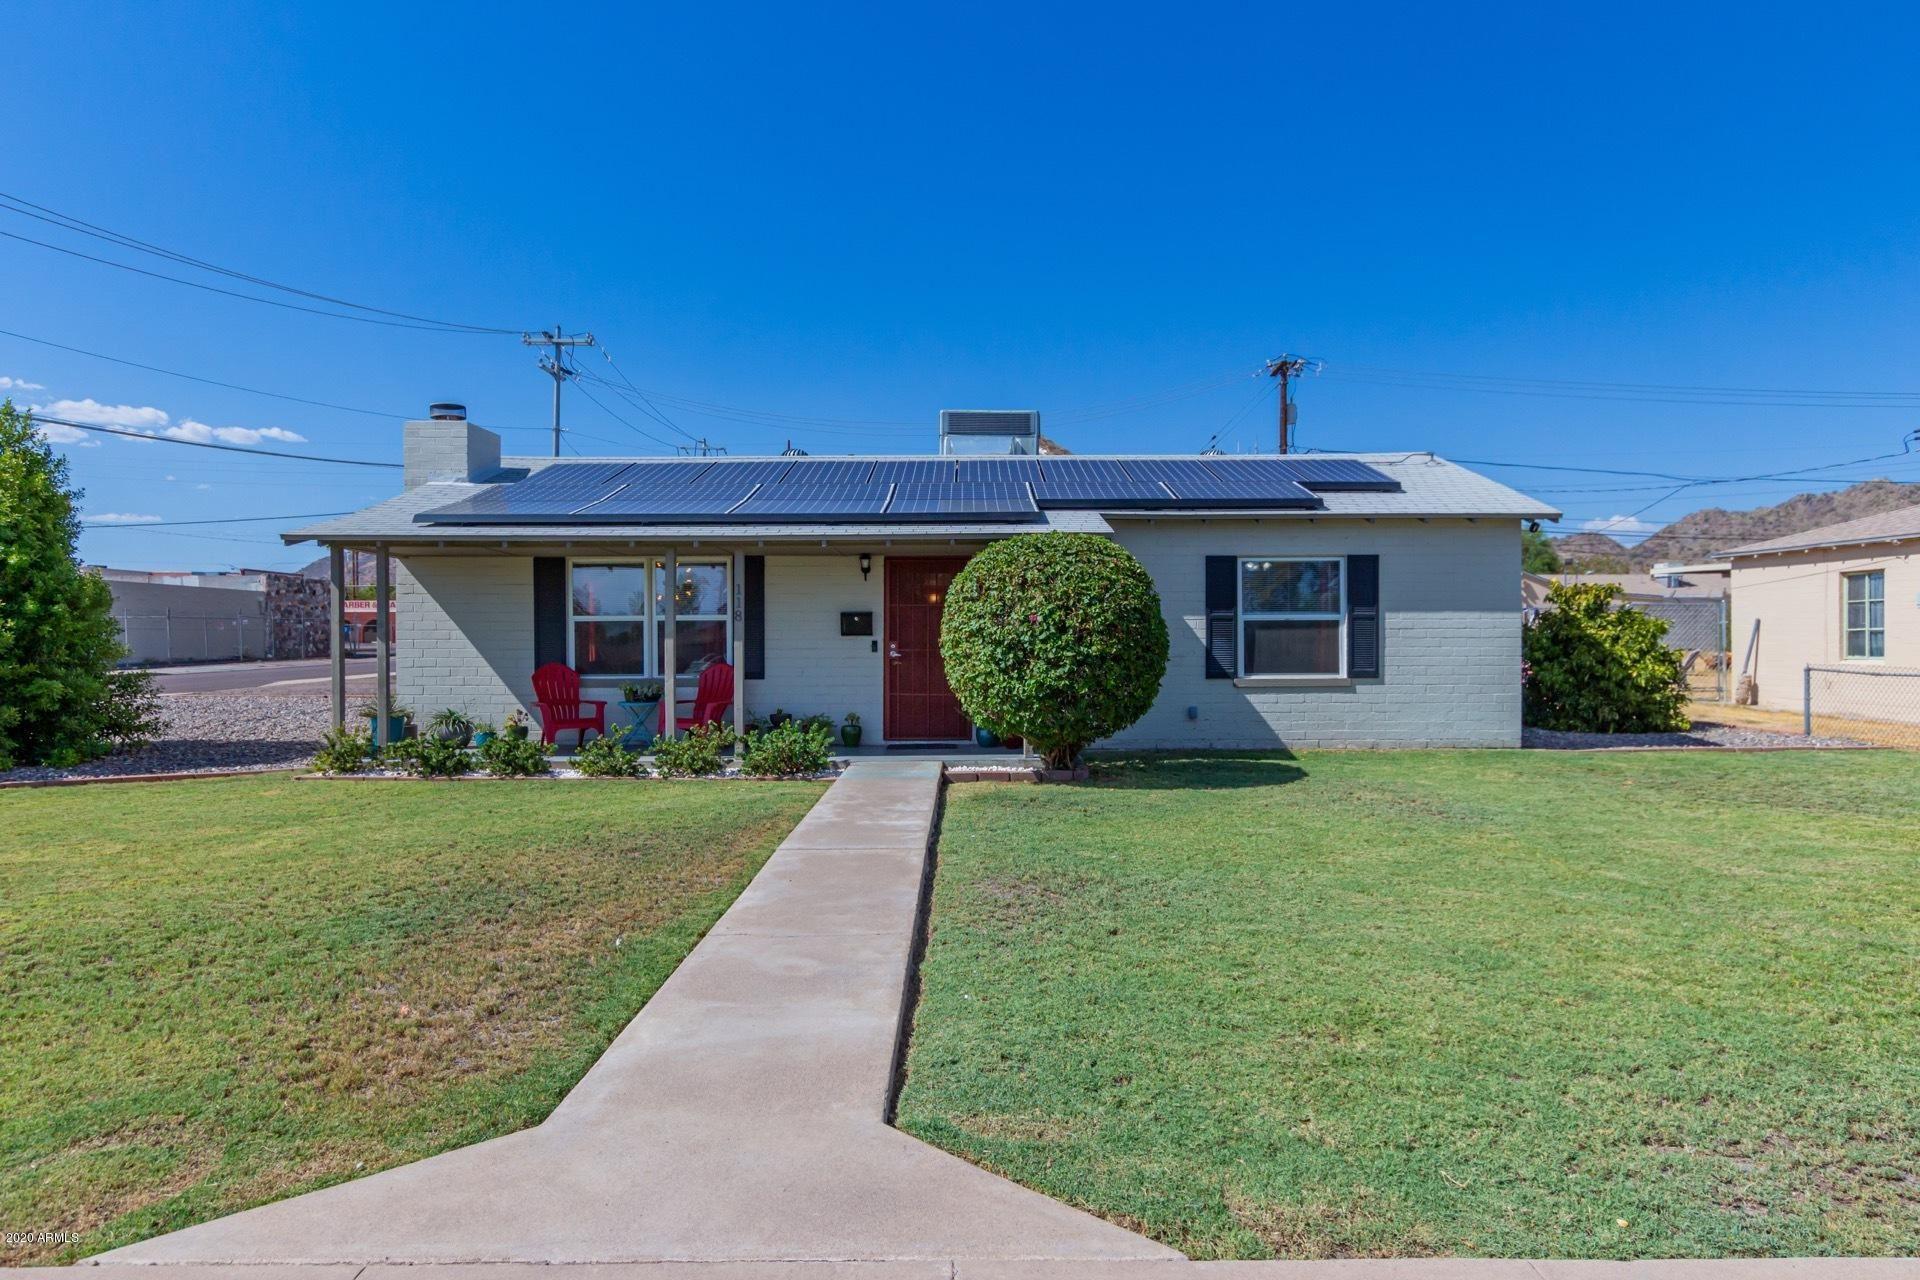 118 W SUNNYSLOPE Lane, Phoenix, AZ 85021 - MLS#: 6118536